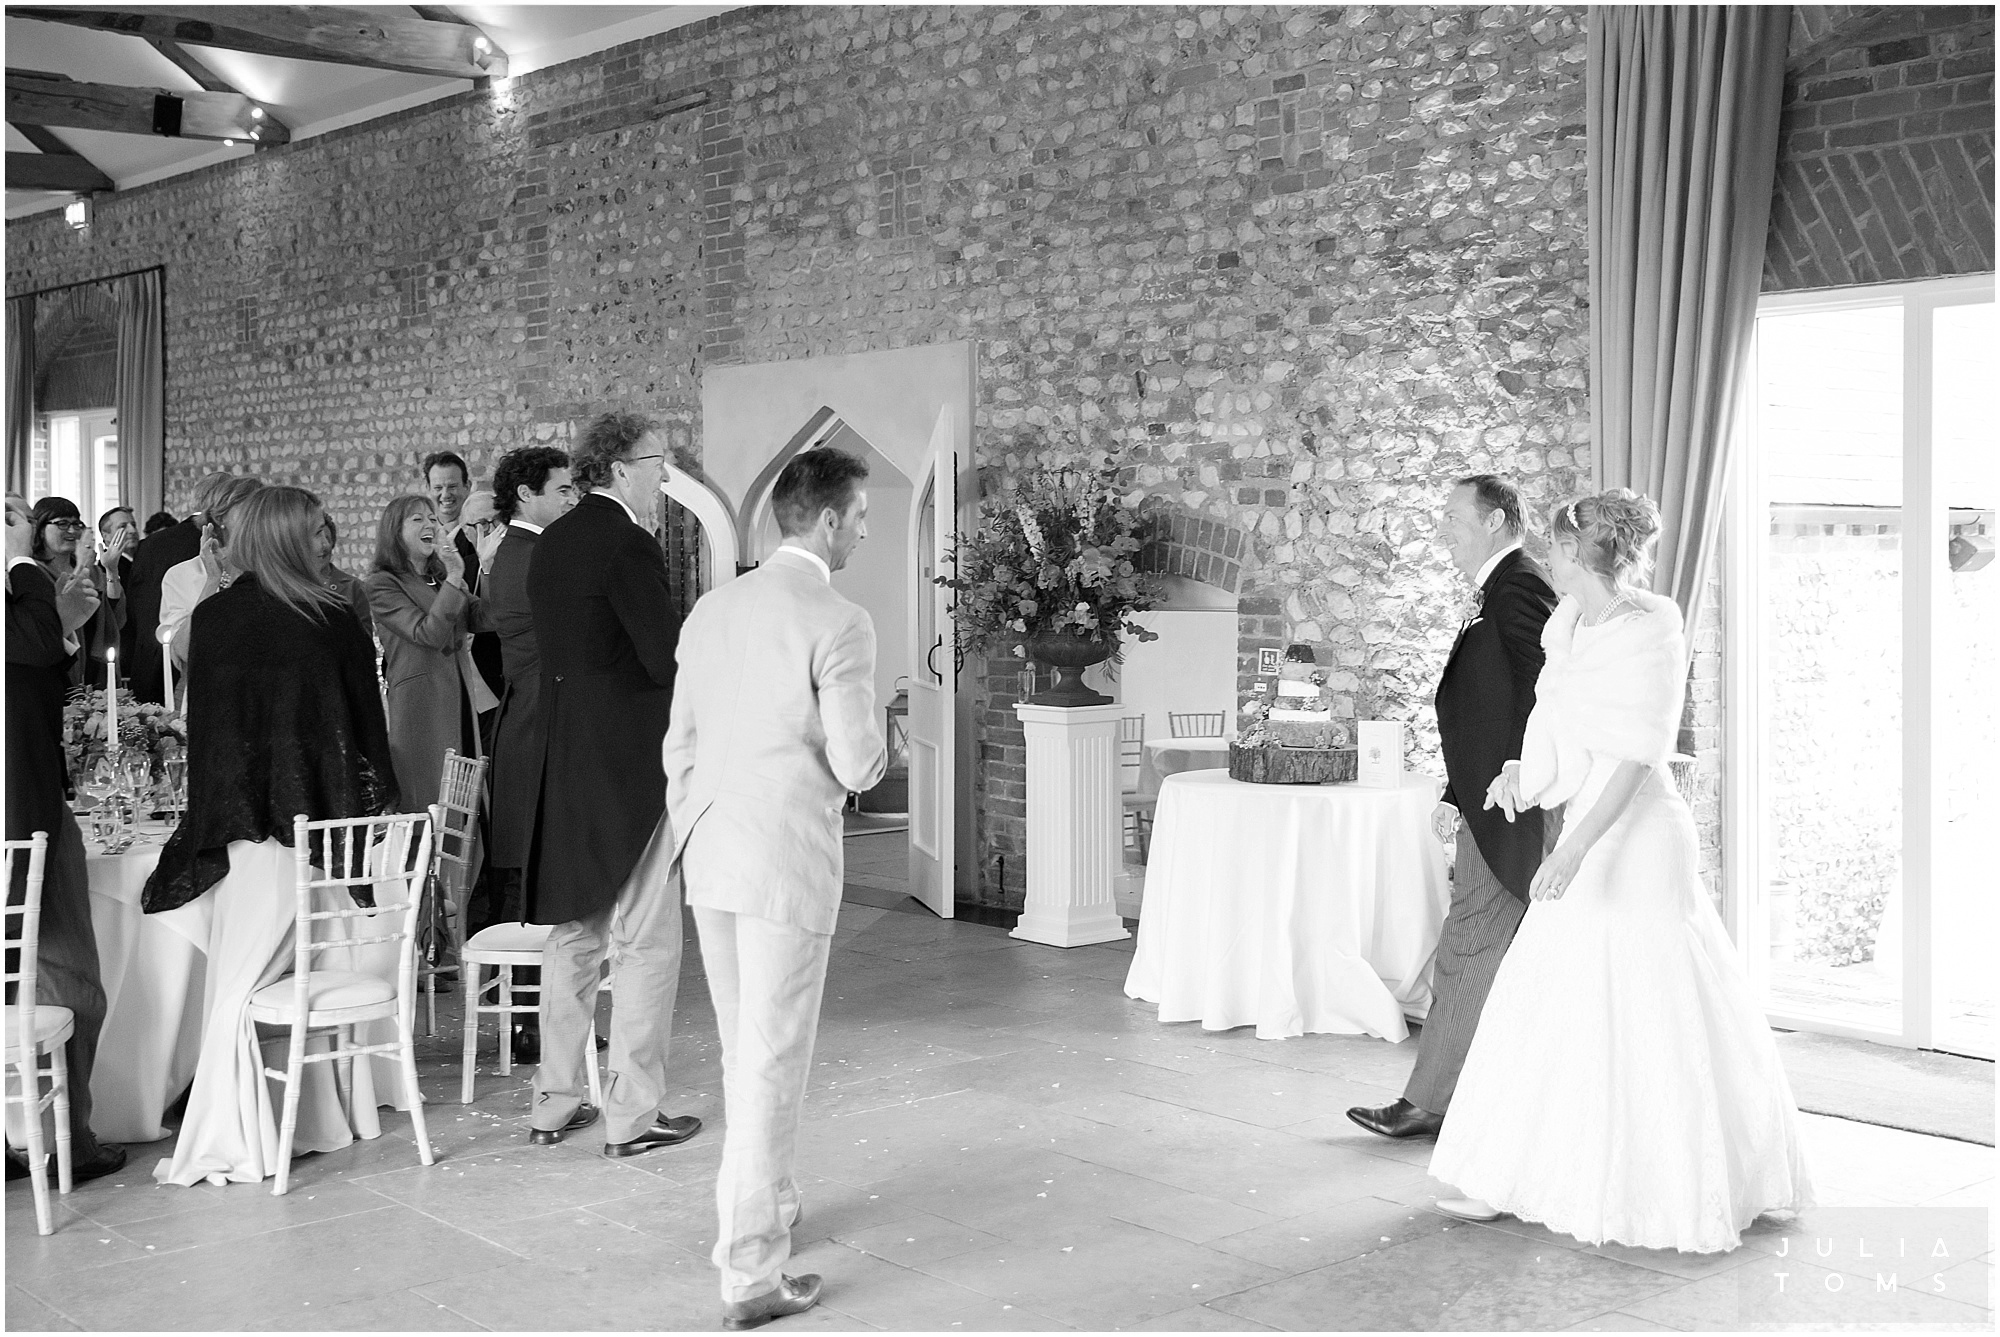 farbridge_barn_wedding_photographer_chichester_047.jpg